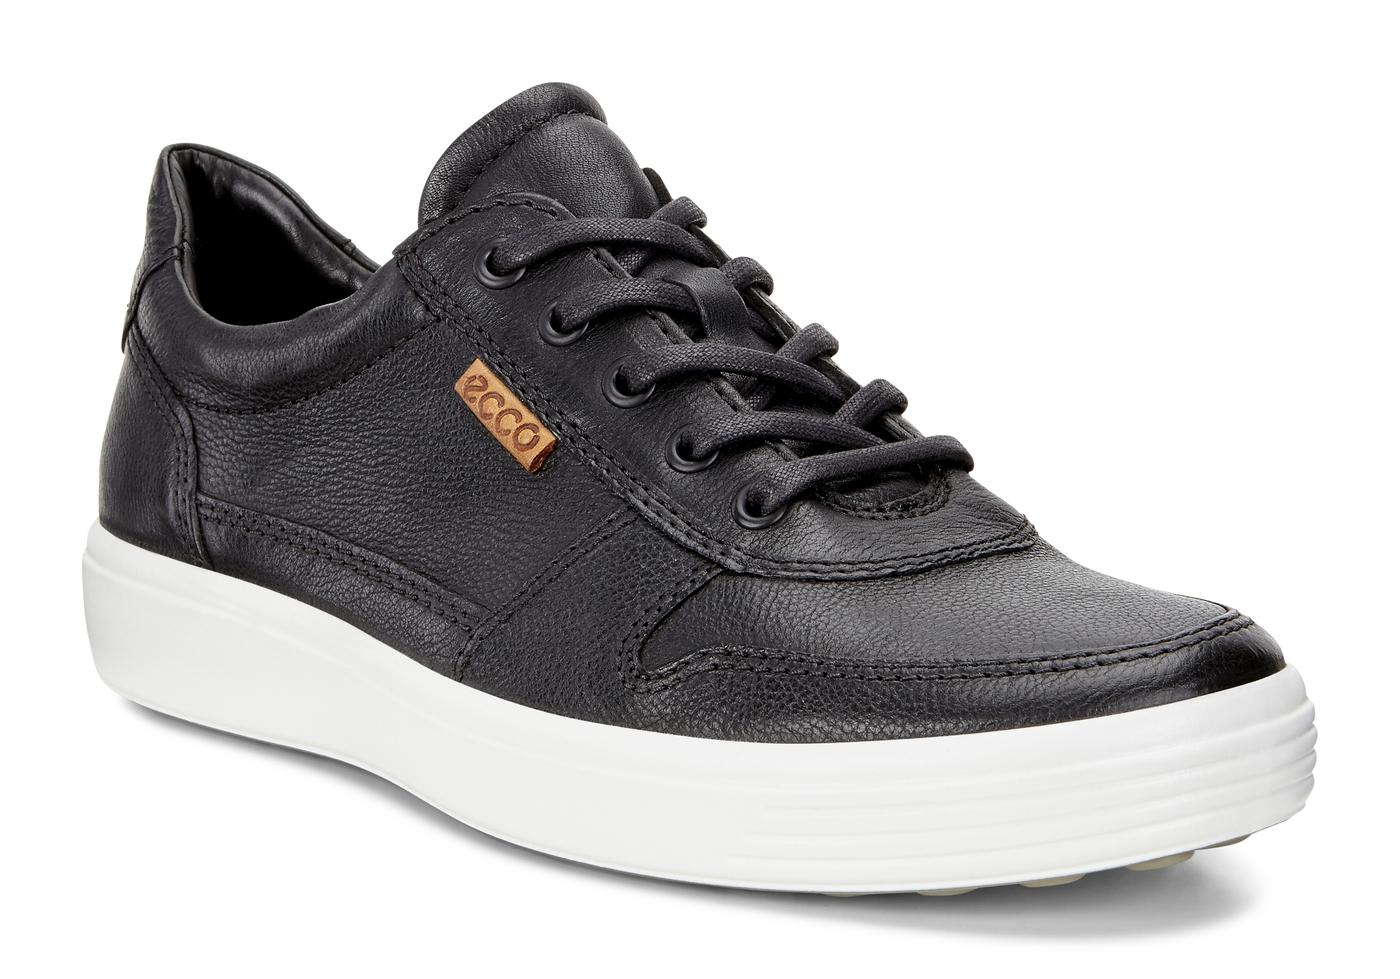 8e75c399d5ec ECCO Mens Soft 7 Retro Sneaker